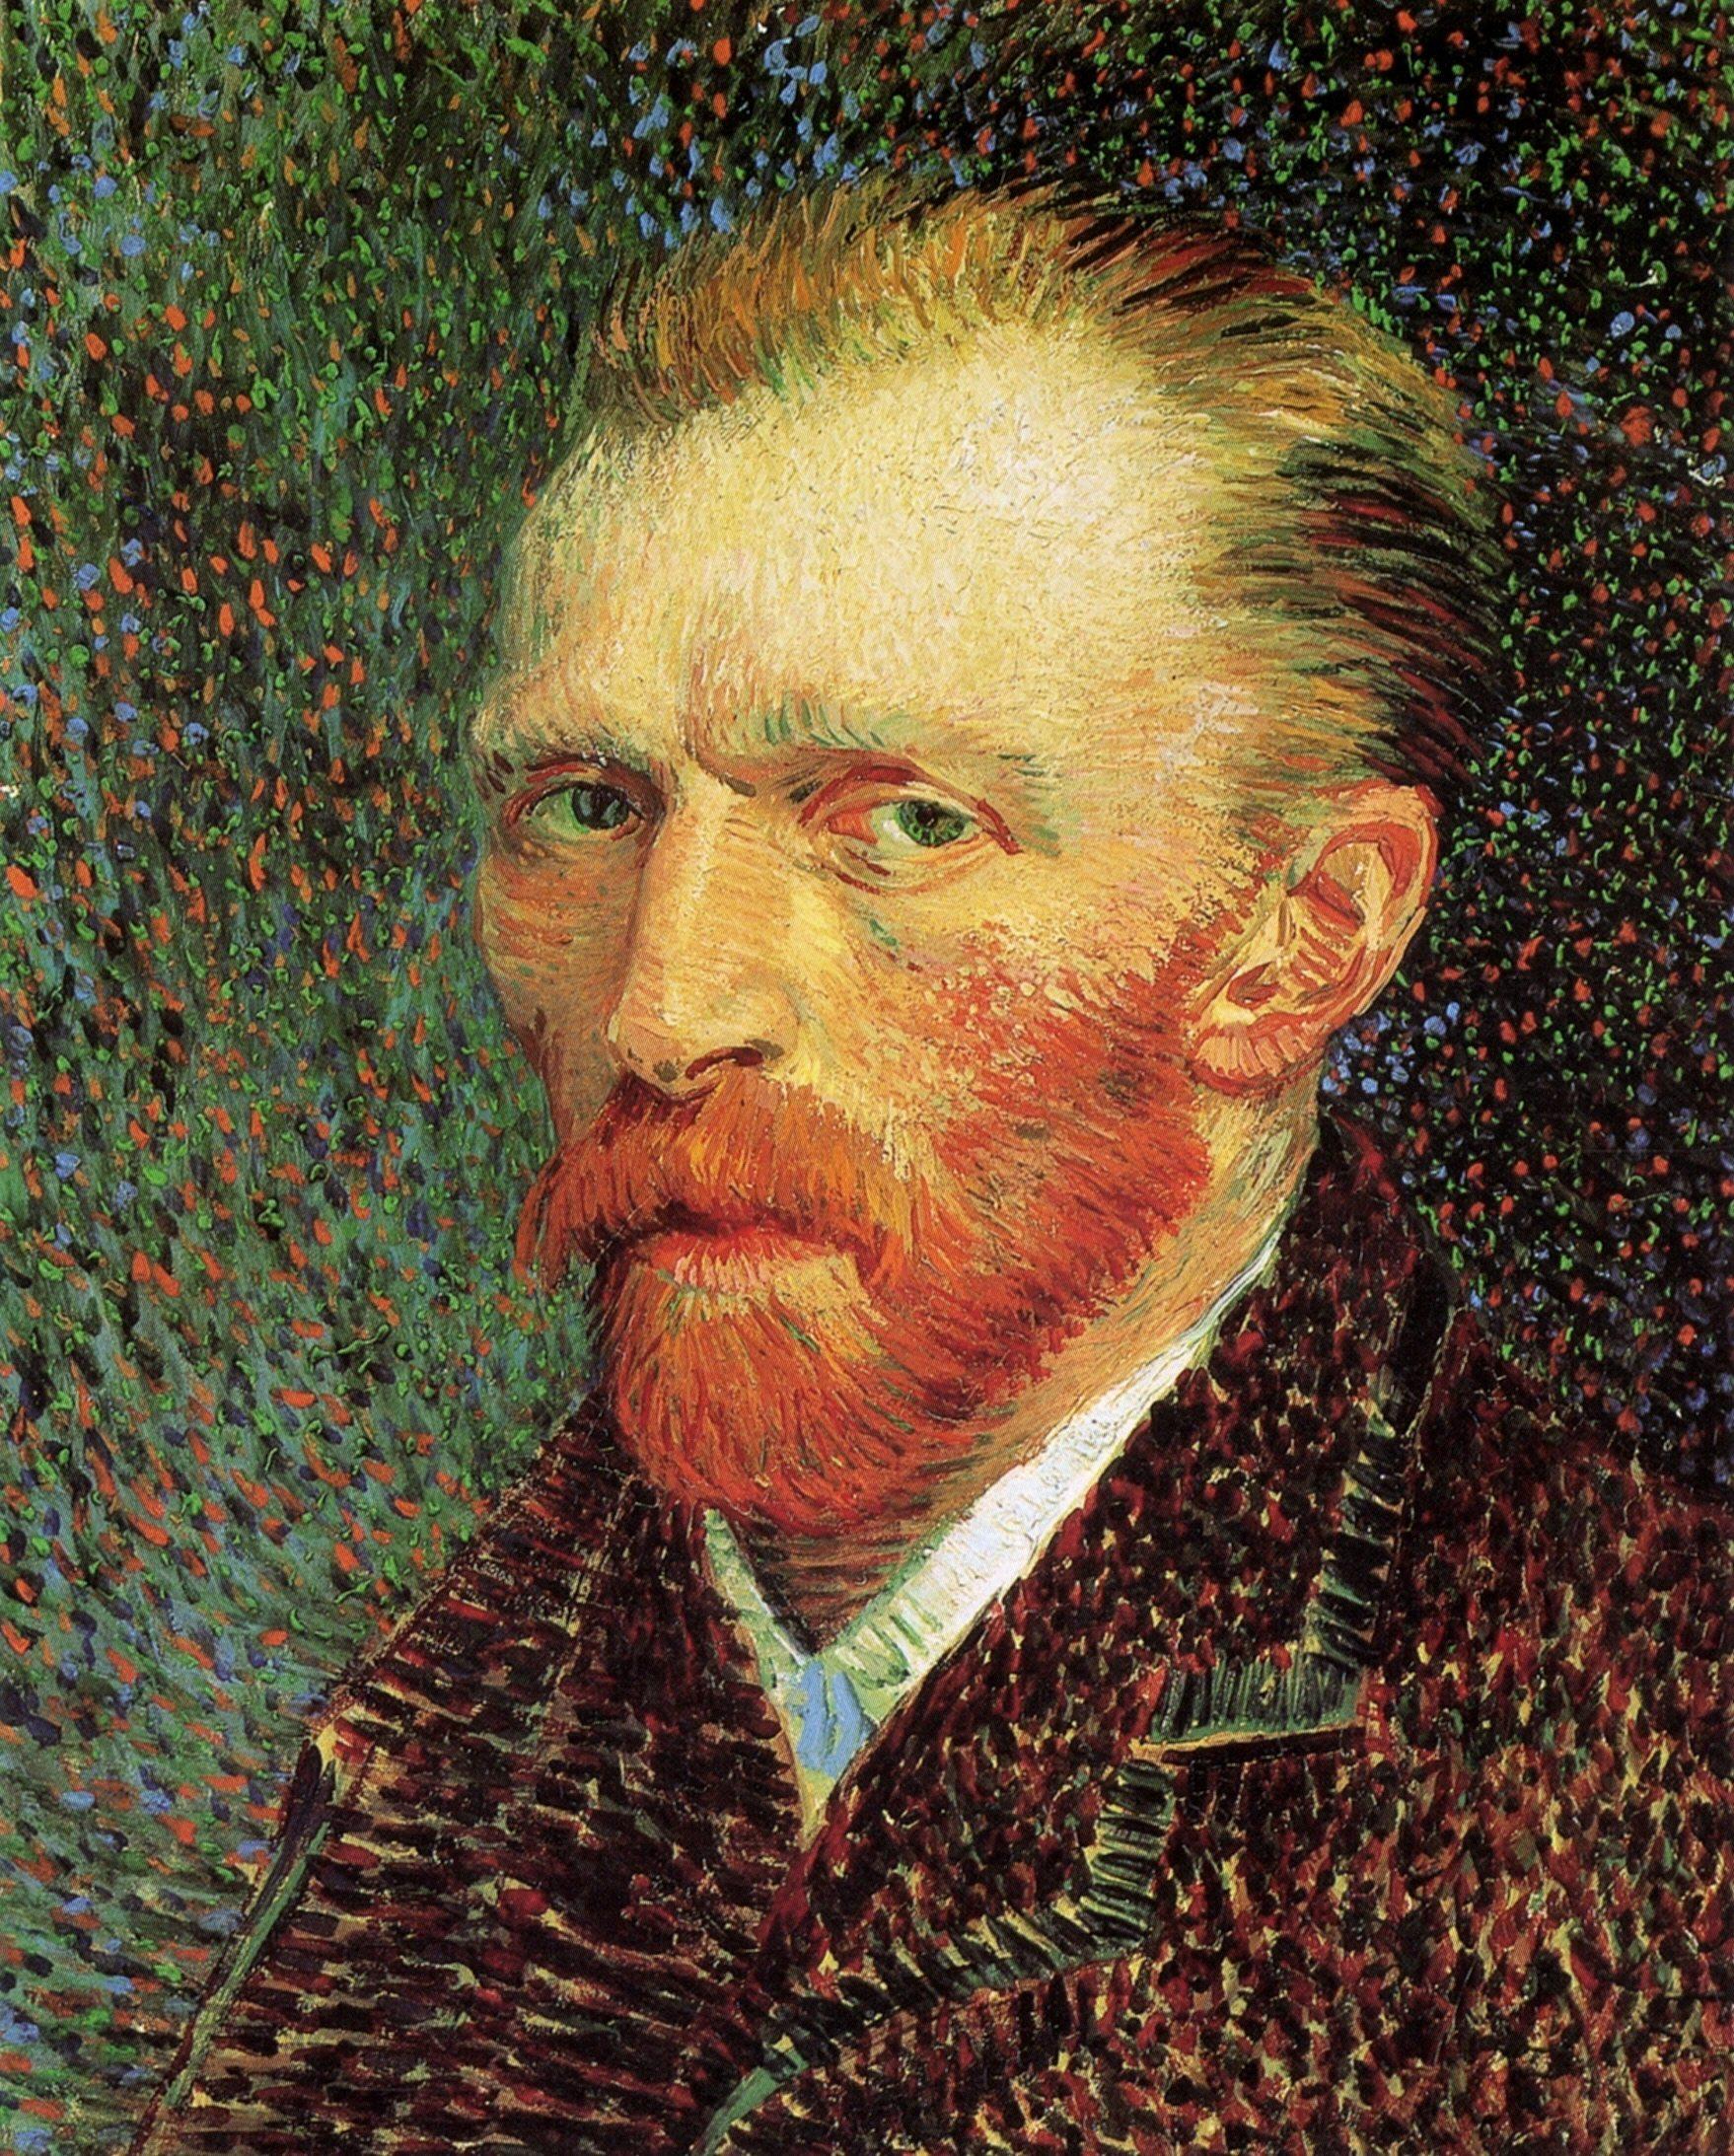 Self-Portrait, 1887 - Vincent van Gogh - WikiArt.org